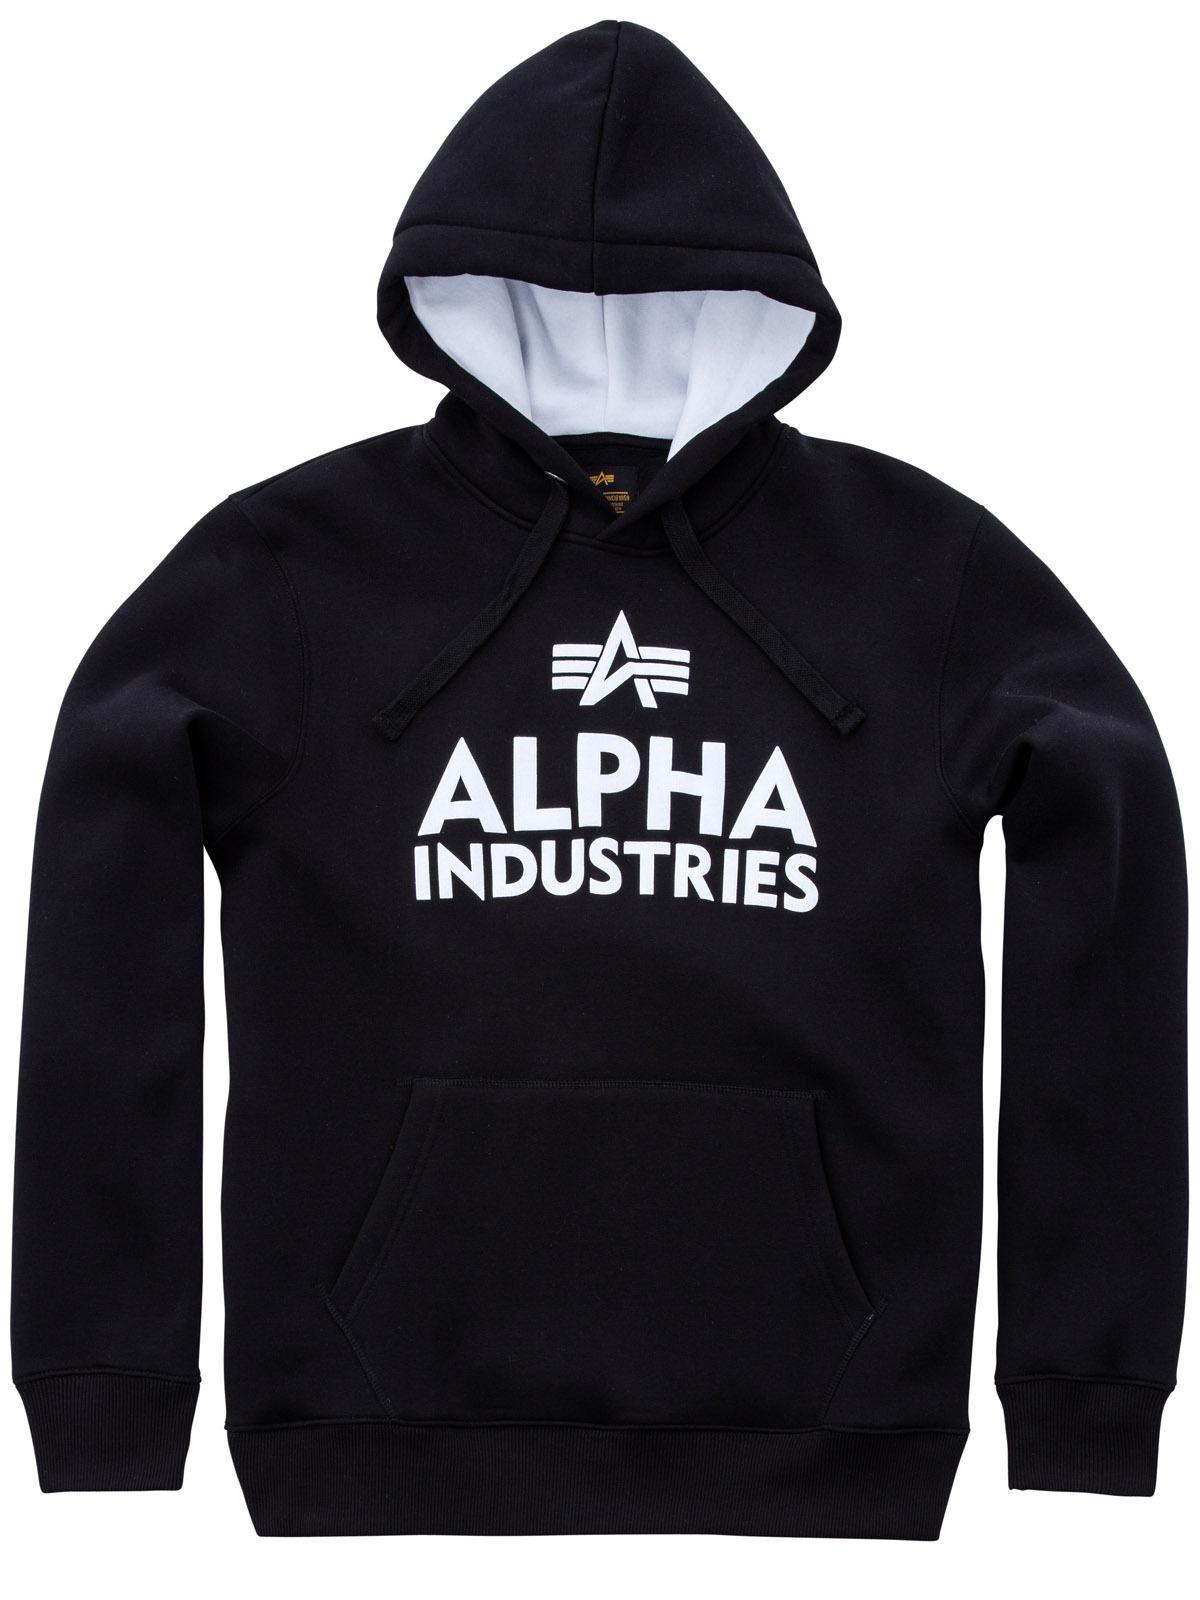 Alpha Industries Kapuzenpullover Foam Print Hoodie Schwarz 143302 95  6113